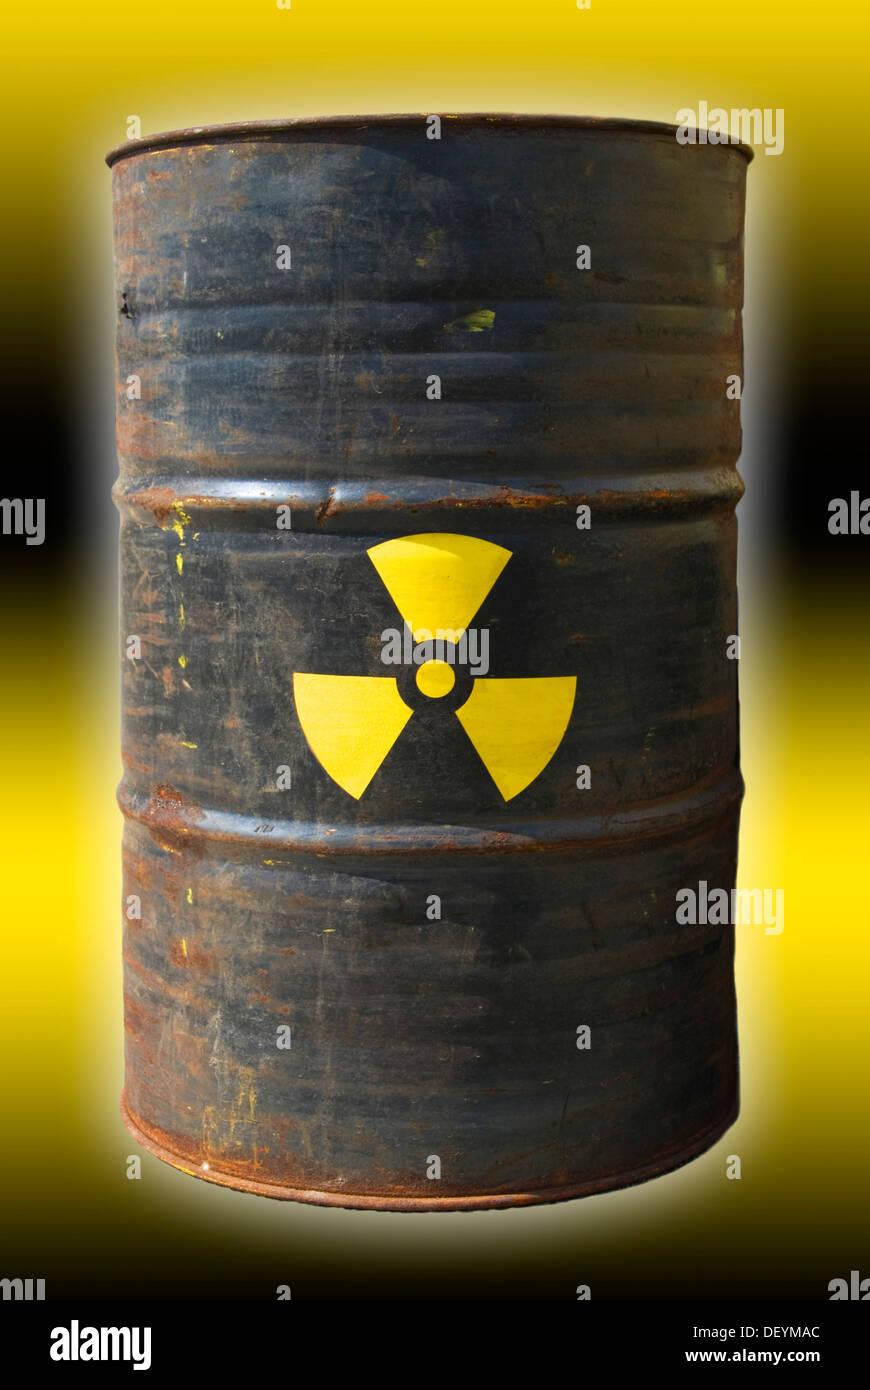 Rusty barrel with a radiation warning symbol - Stock Image